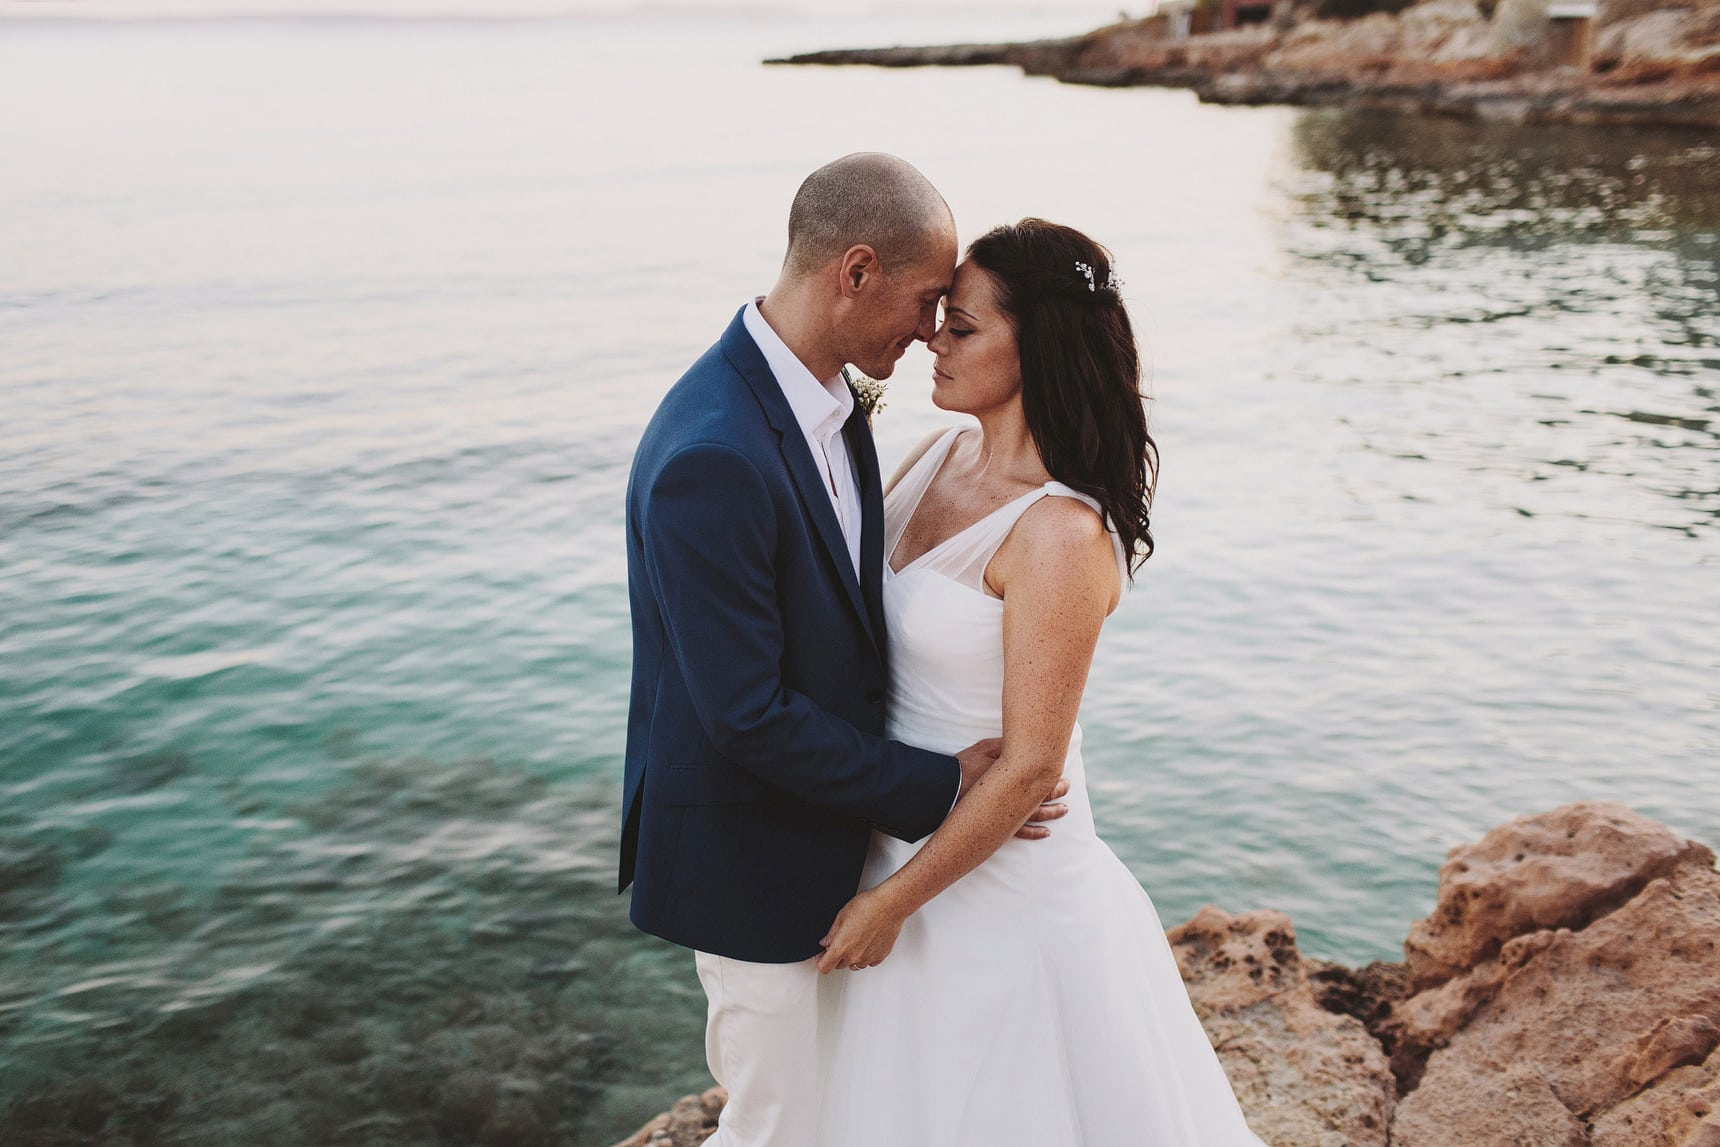 oceanfront wedding photos 2